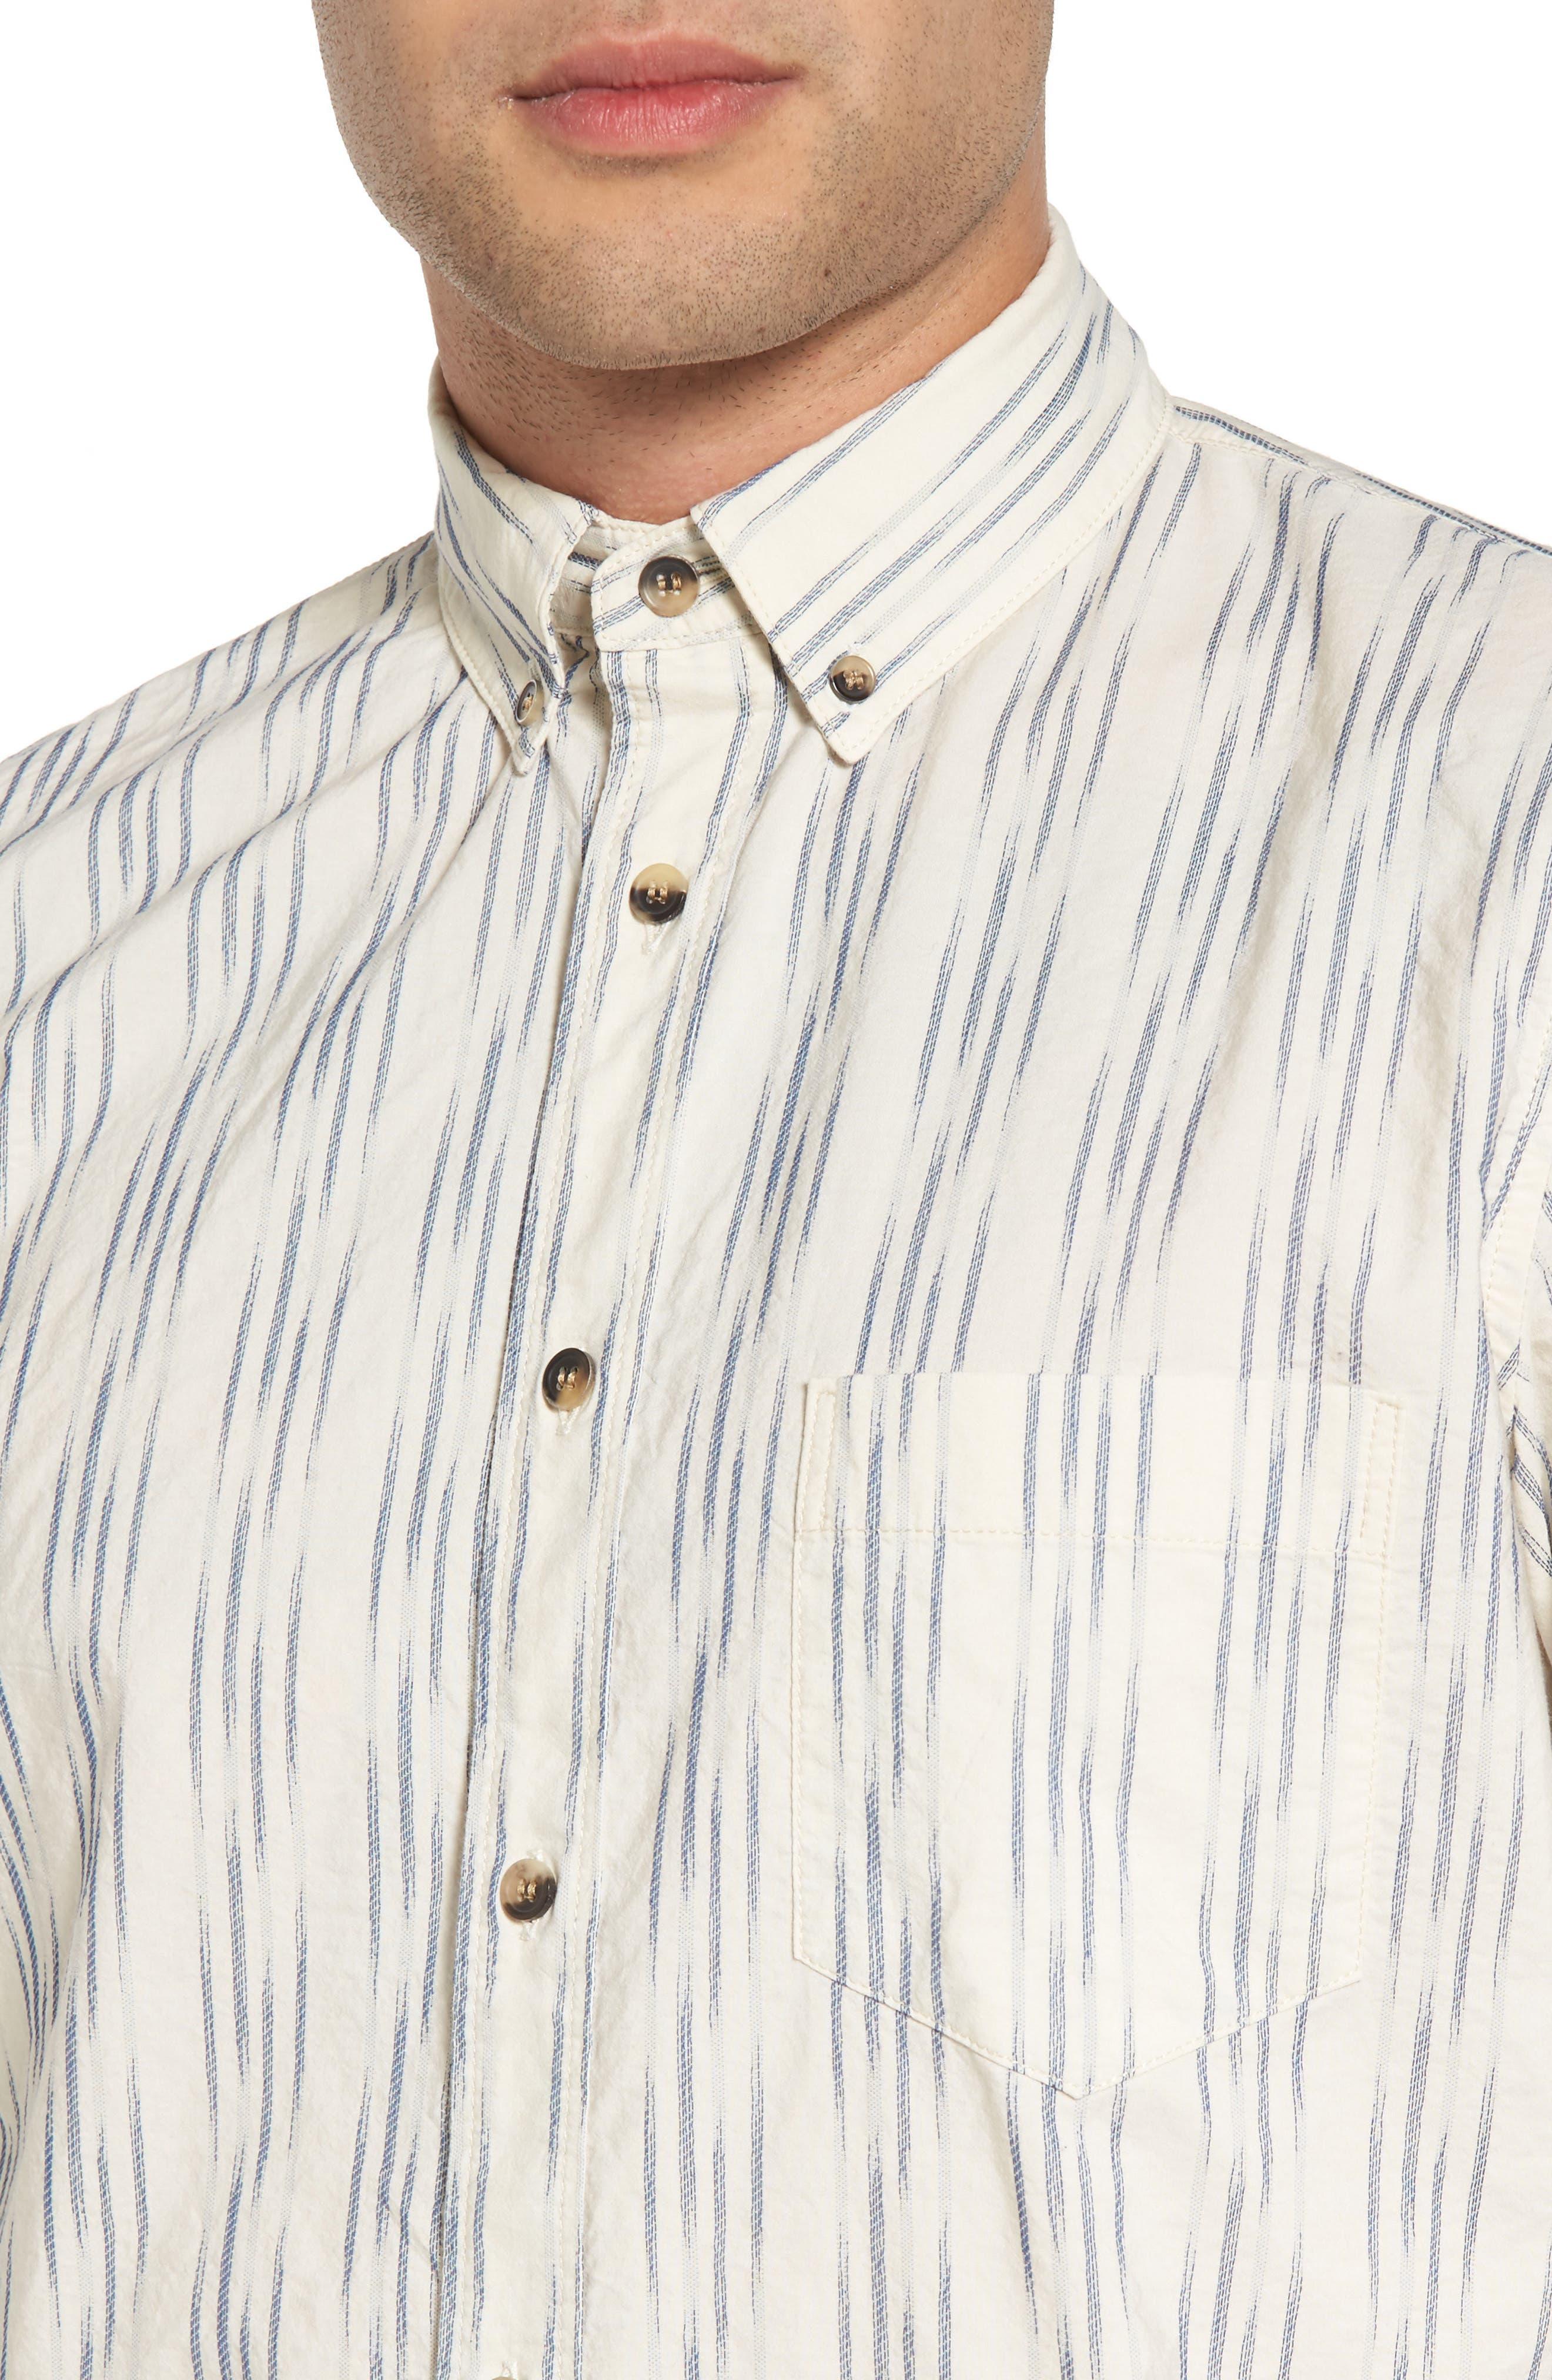 Regular Fit Sport Shirt,                             Alternate thumbnail 4, color,                             Ikat White/Blue